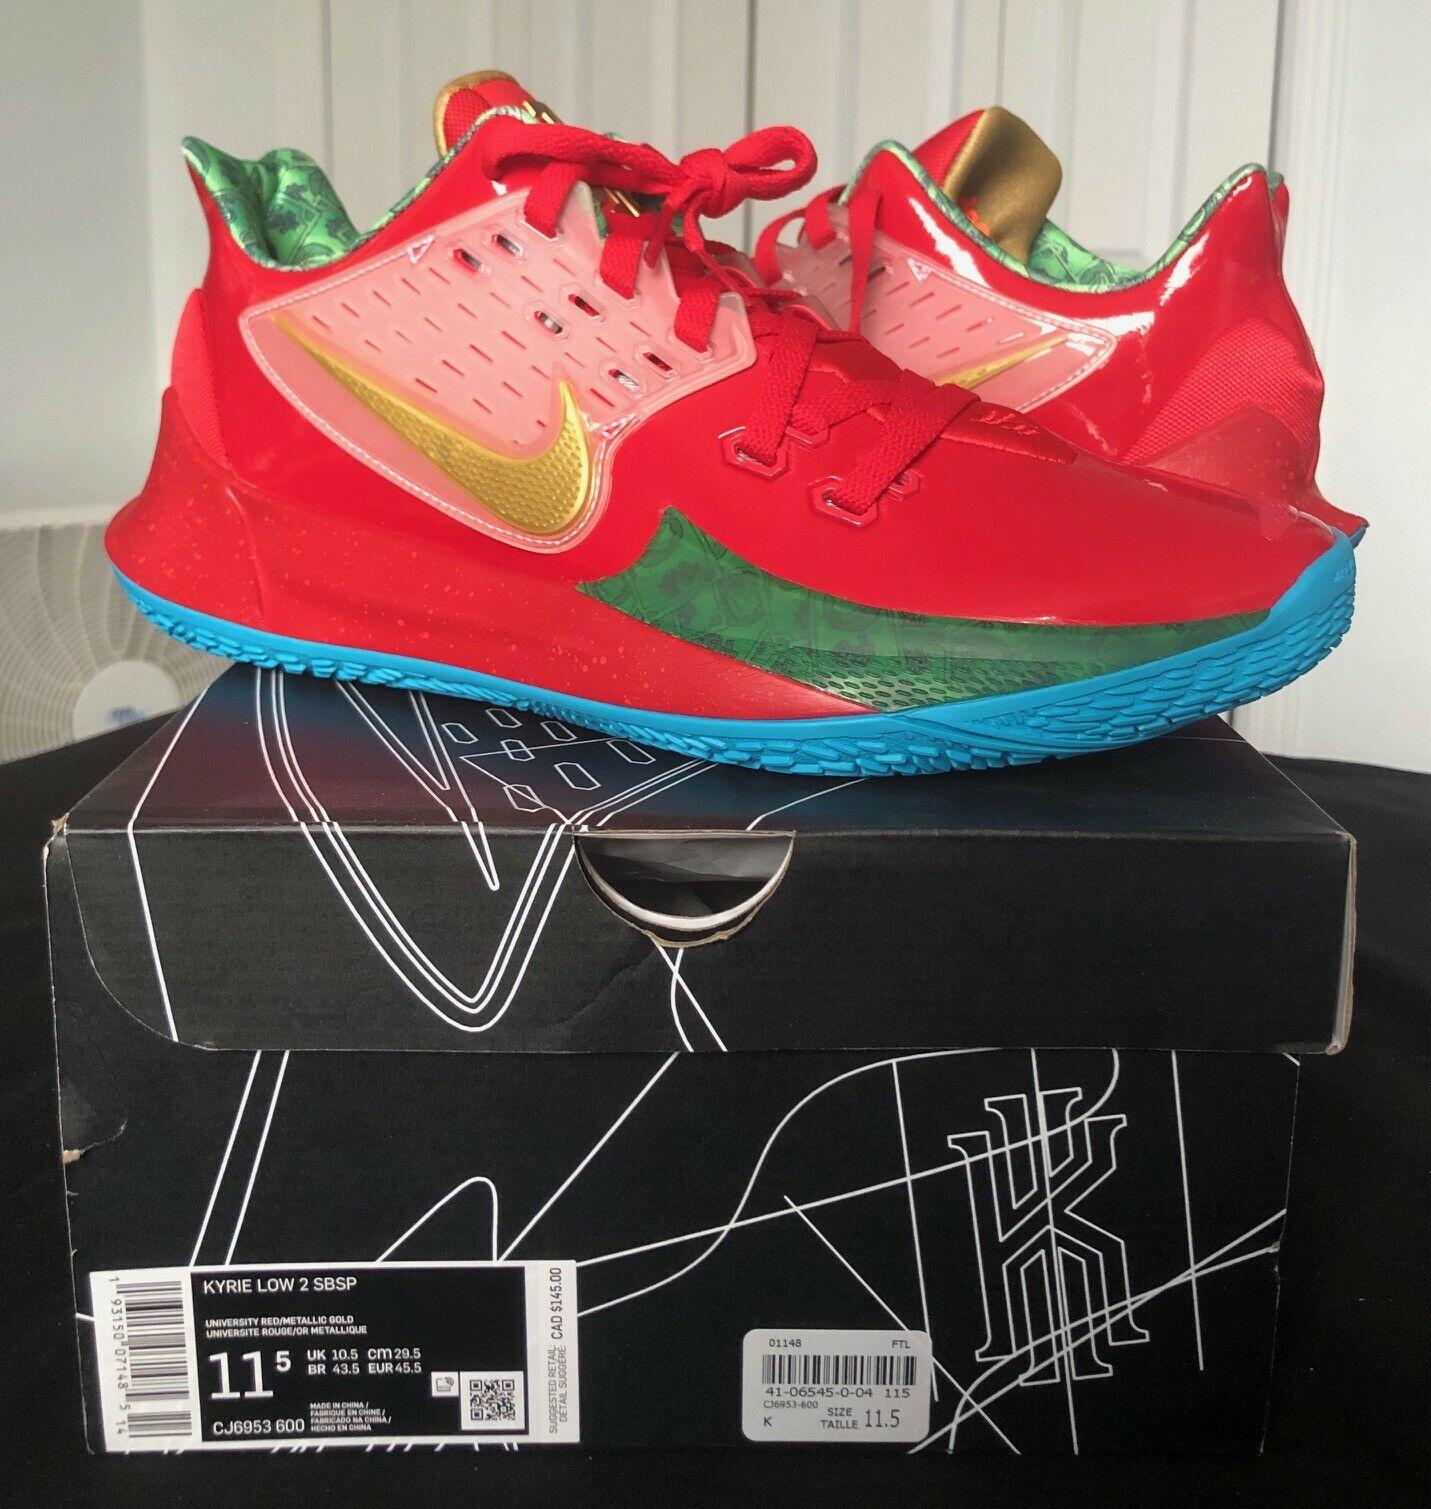 Nike Kyrie 2 Low Spongebob Mr Krabs